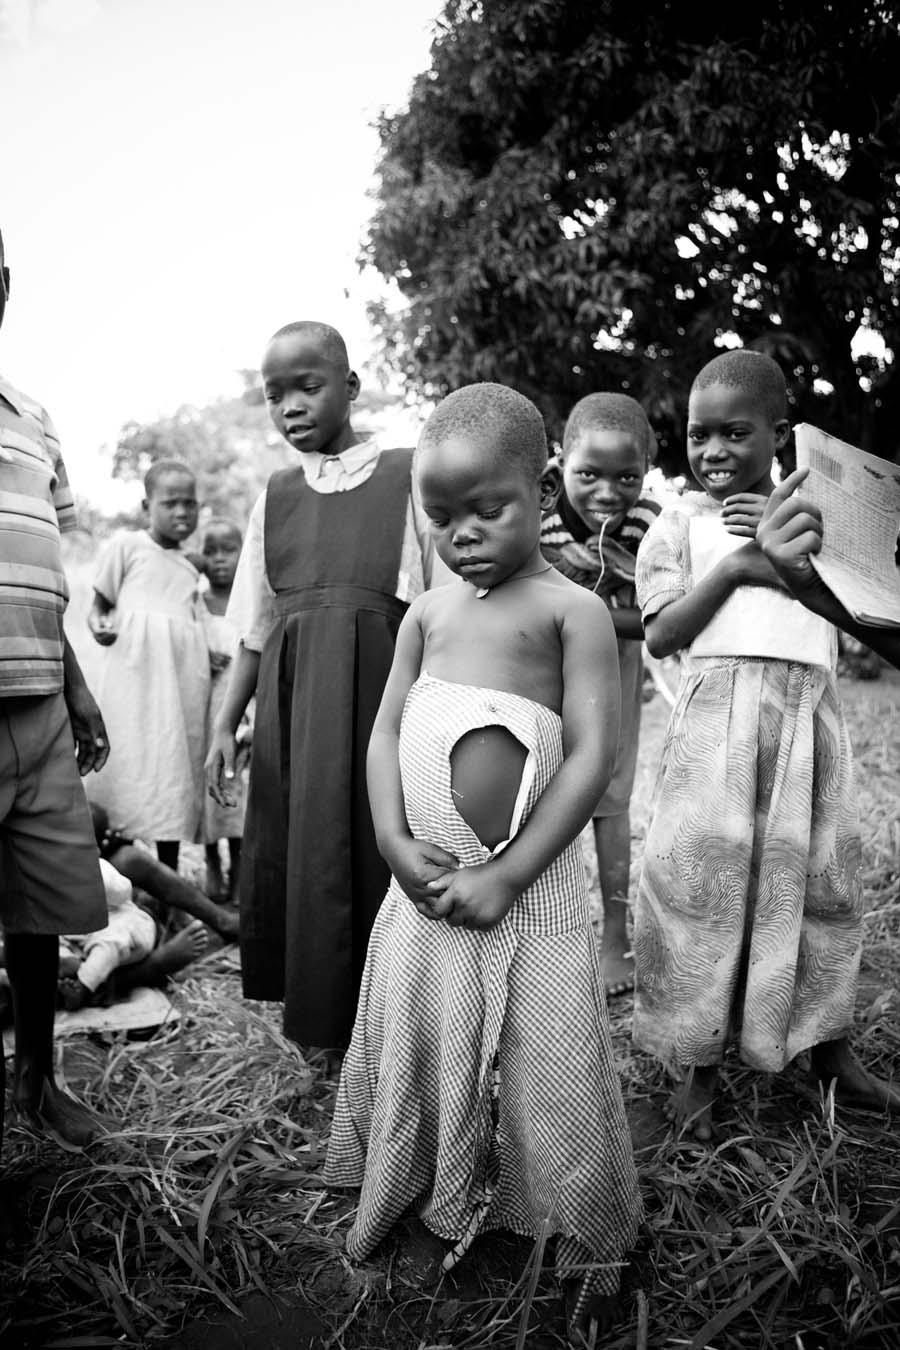 jessicadavisphotography.com | Jessica Davis Photography | Portrait Work in Uganda| Travel Photographer | World Event Photographs 3 (13).jpg